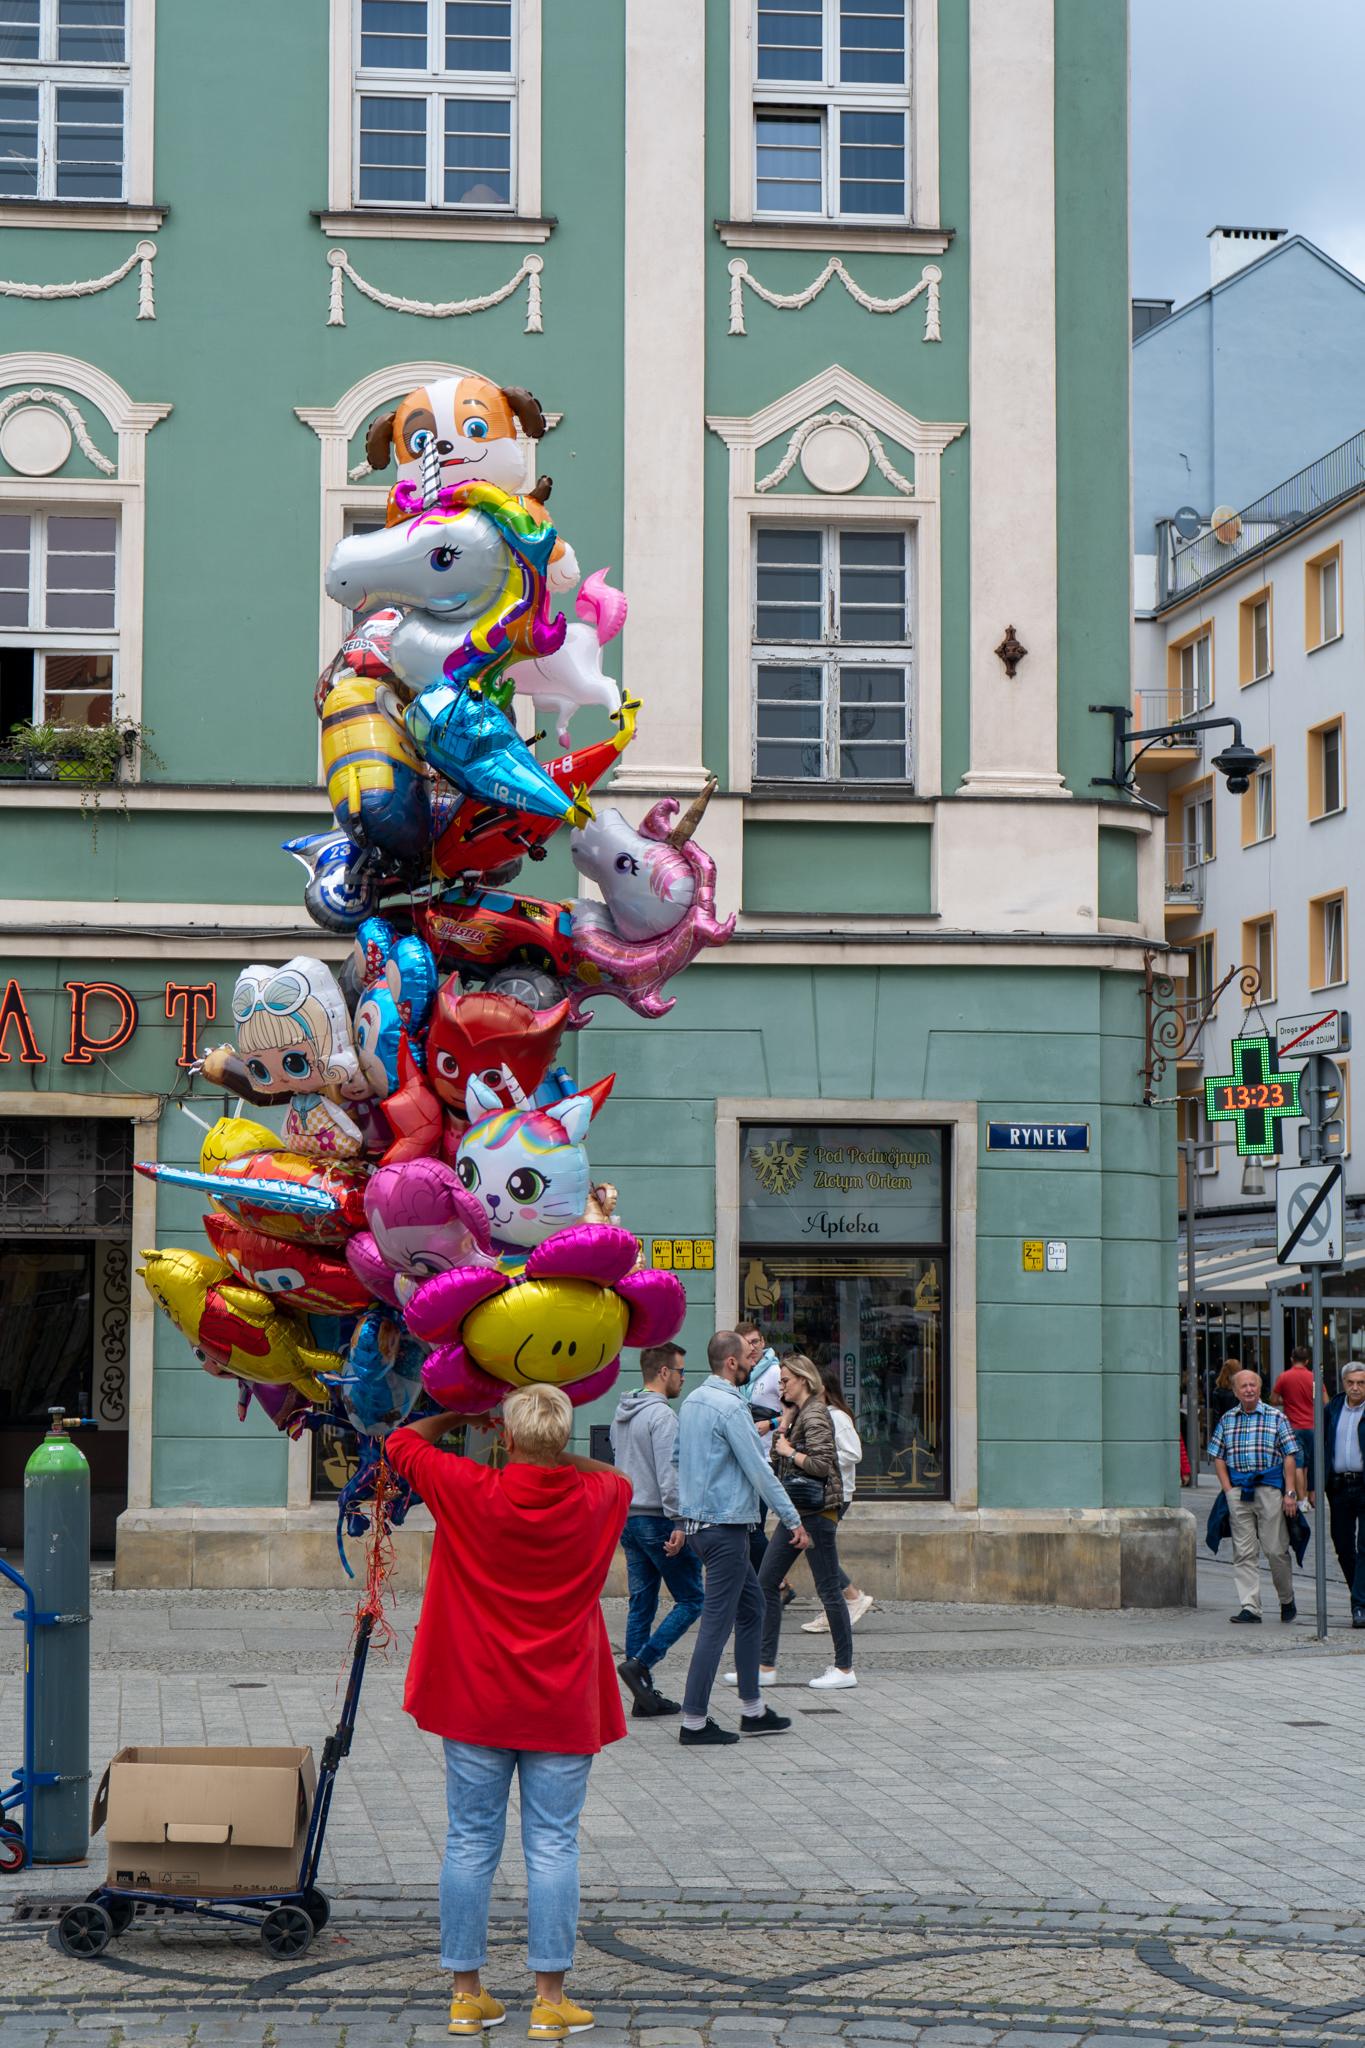 Luftballons auf dem Rynek in Breslau